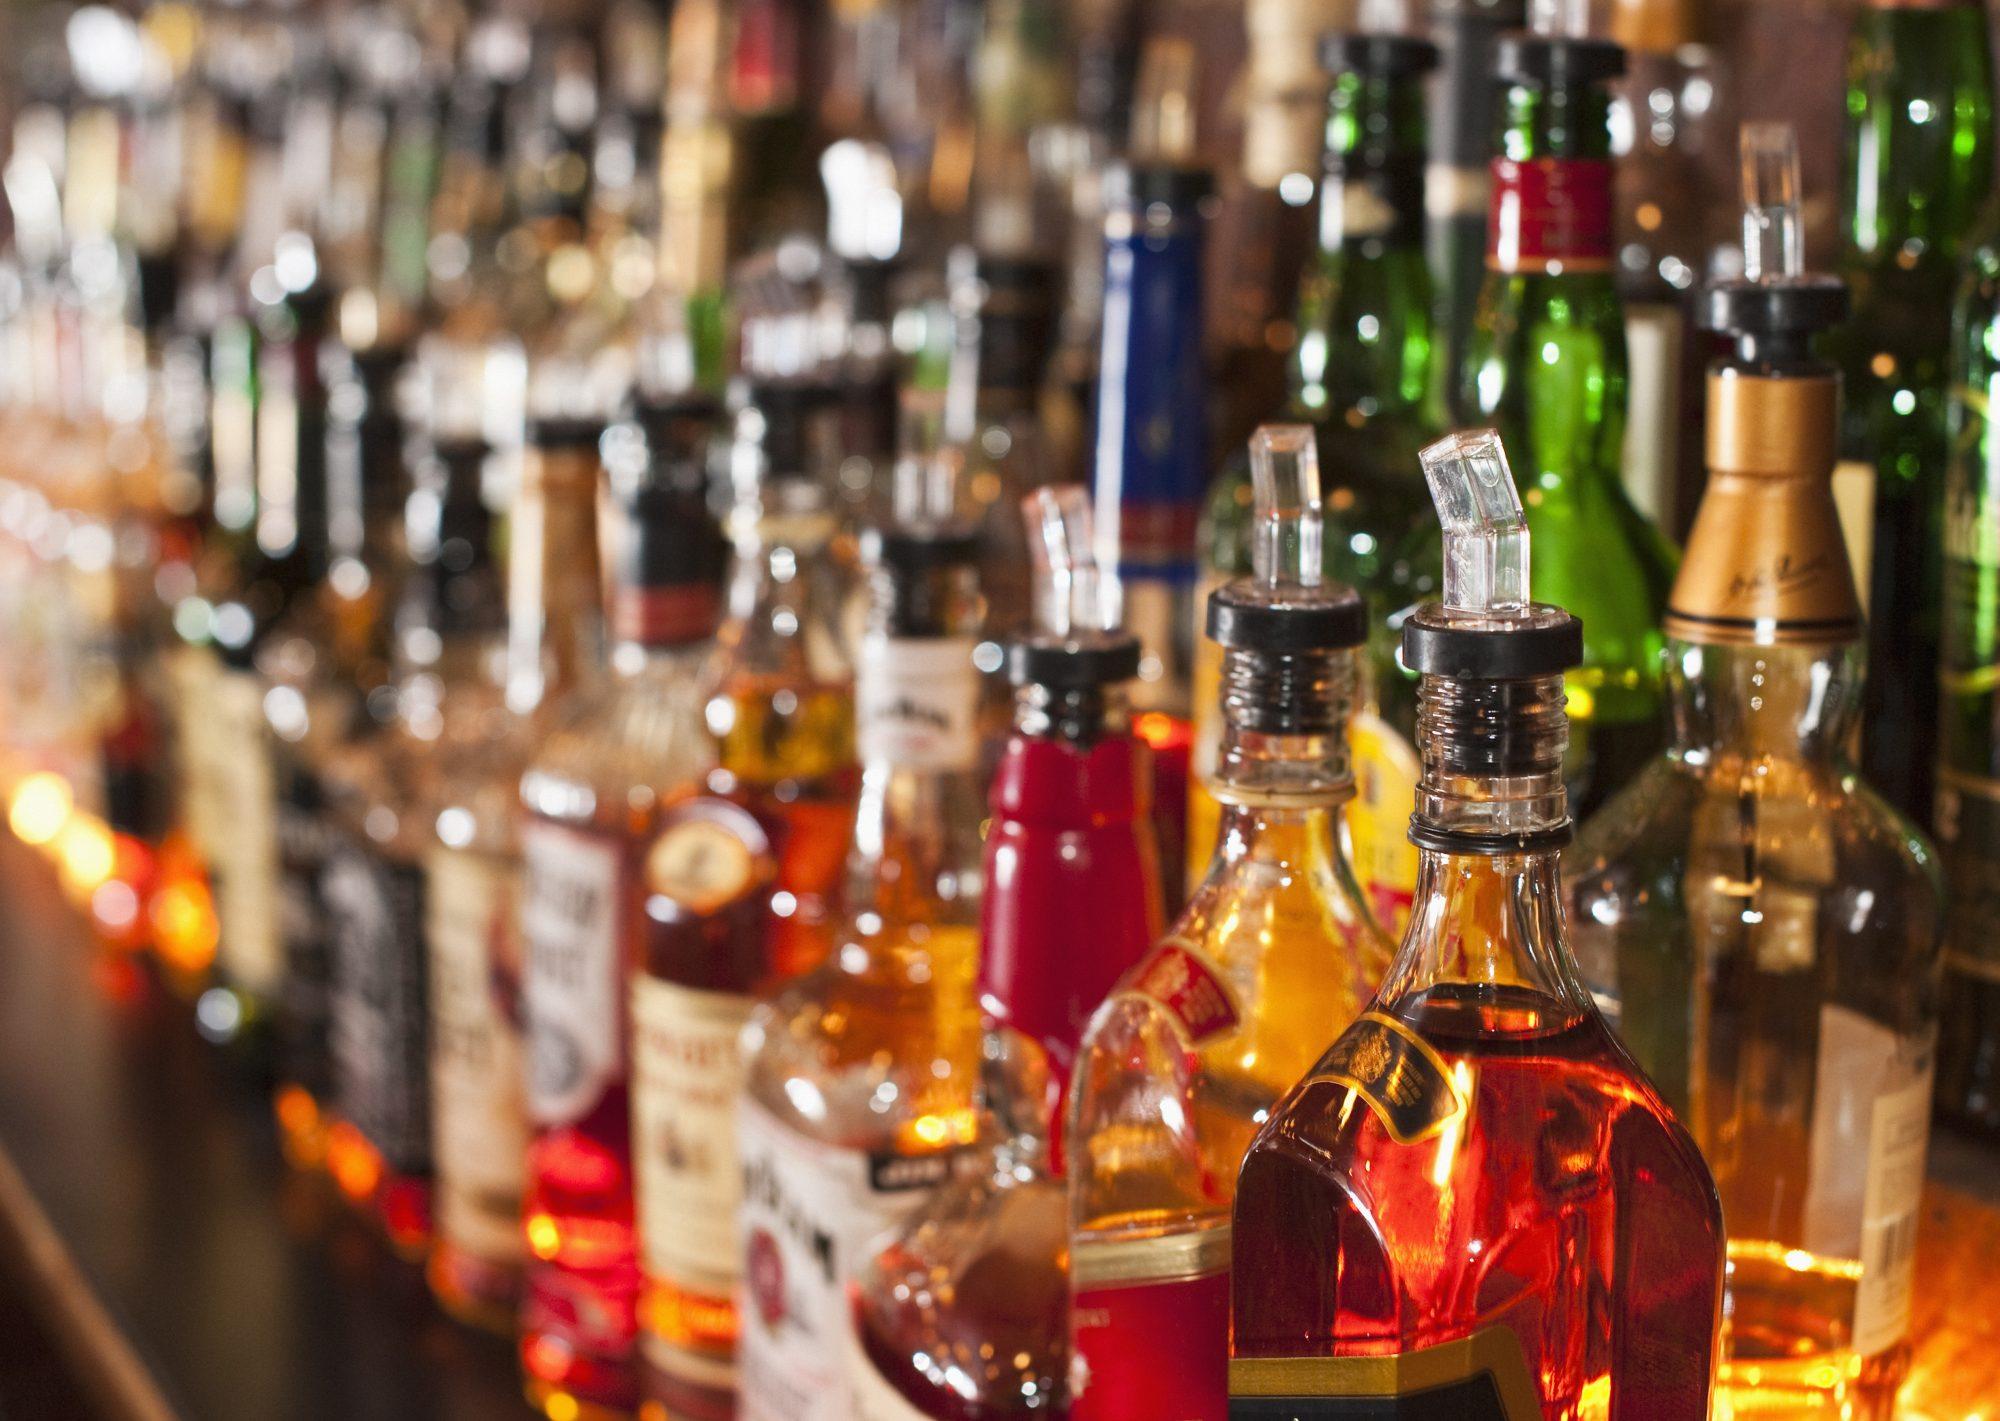 botellas de alcohol